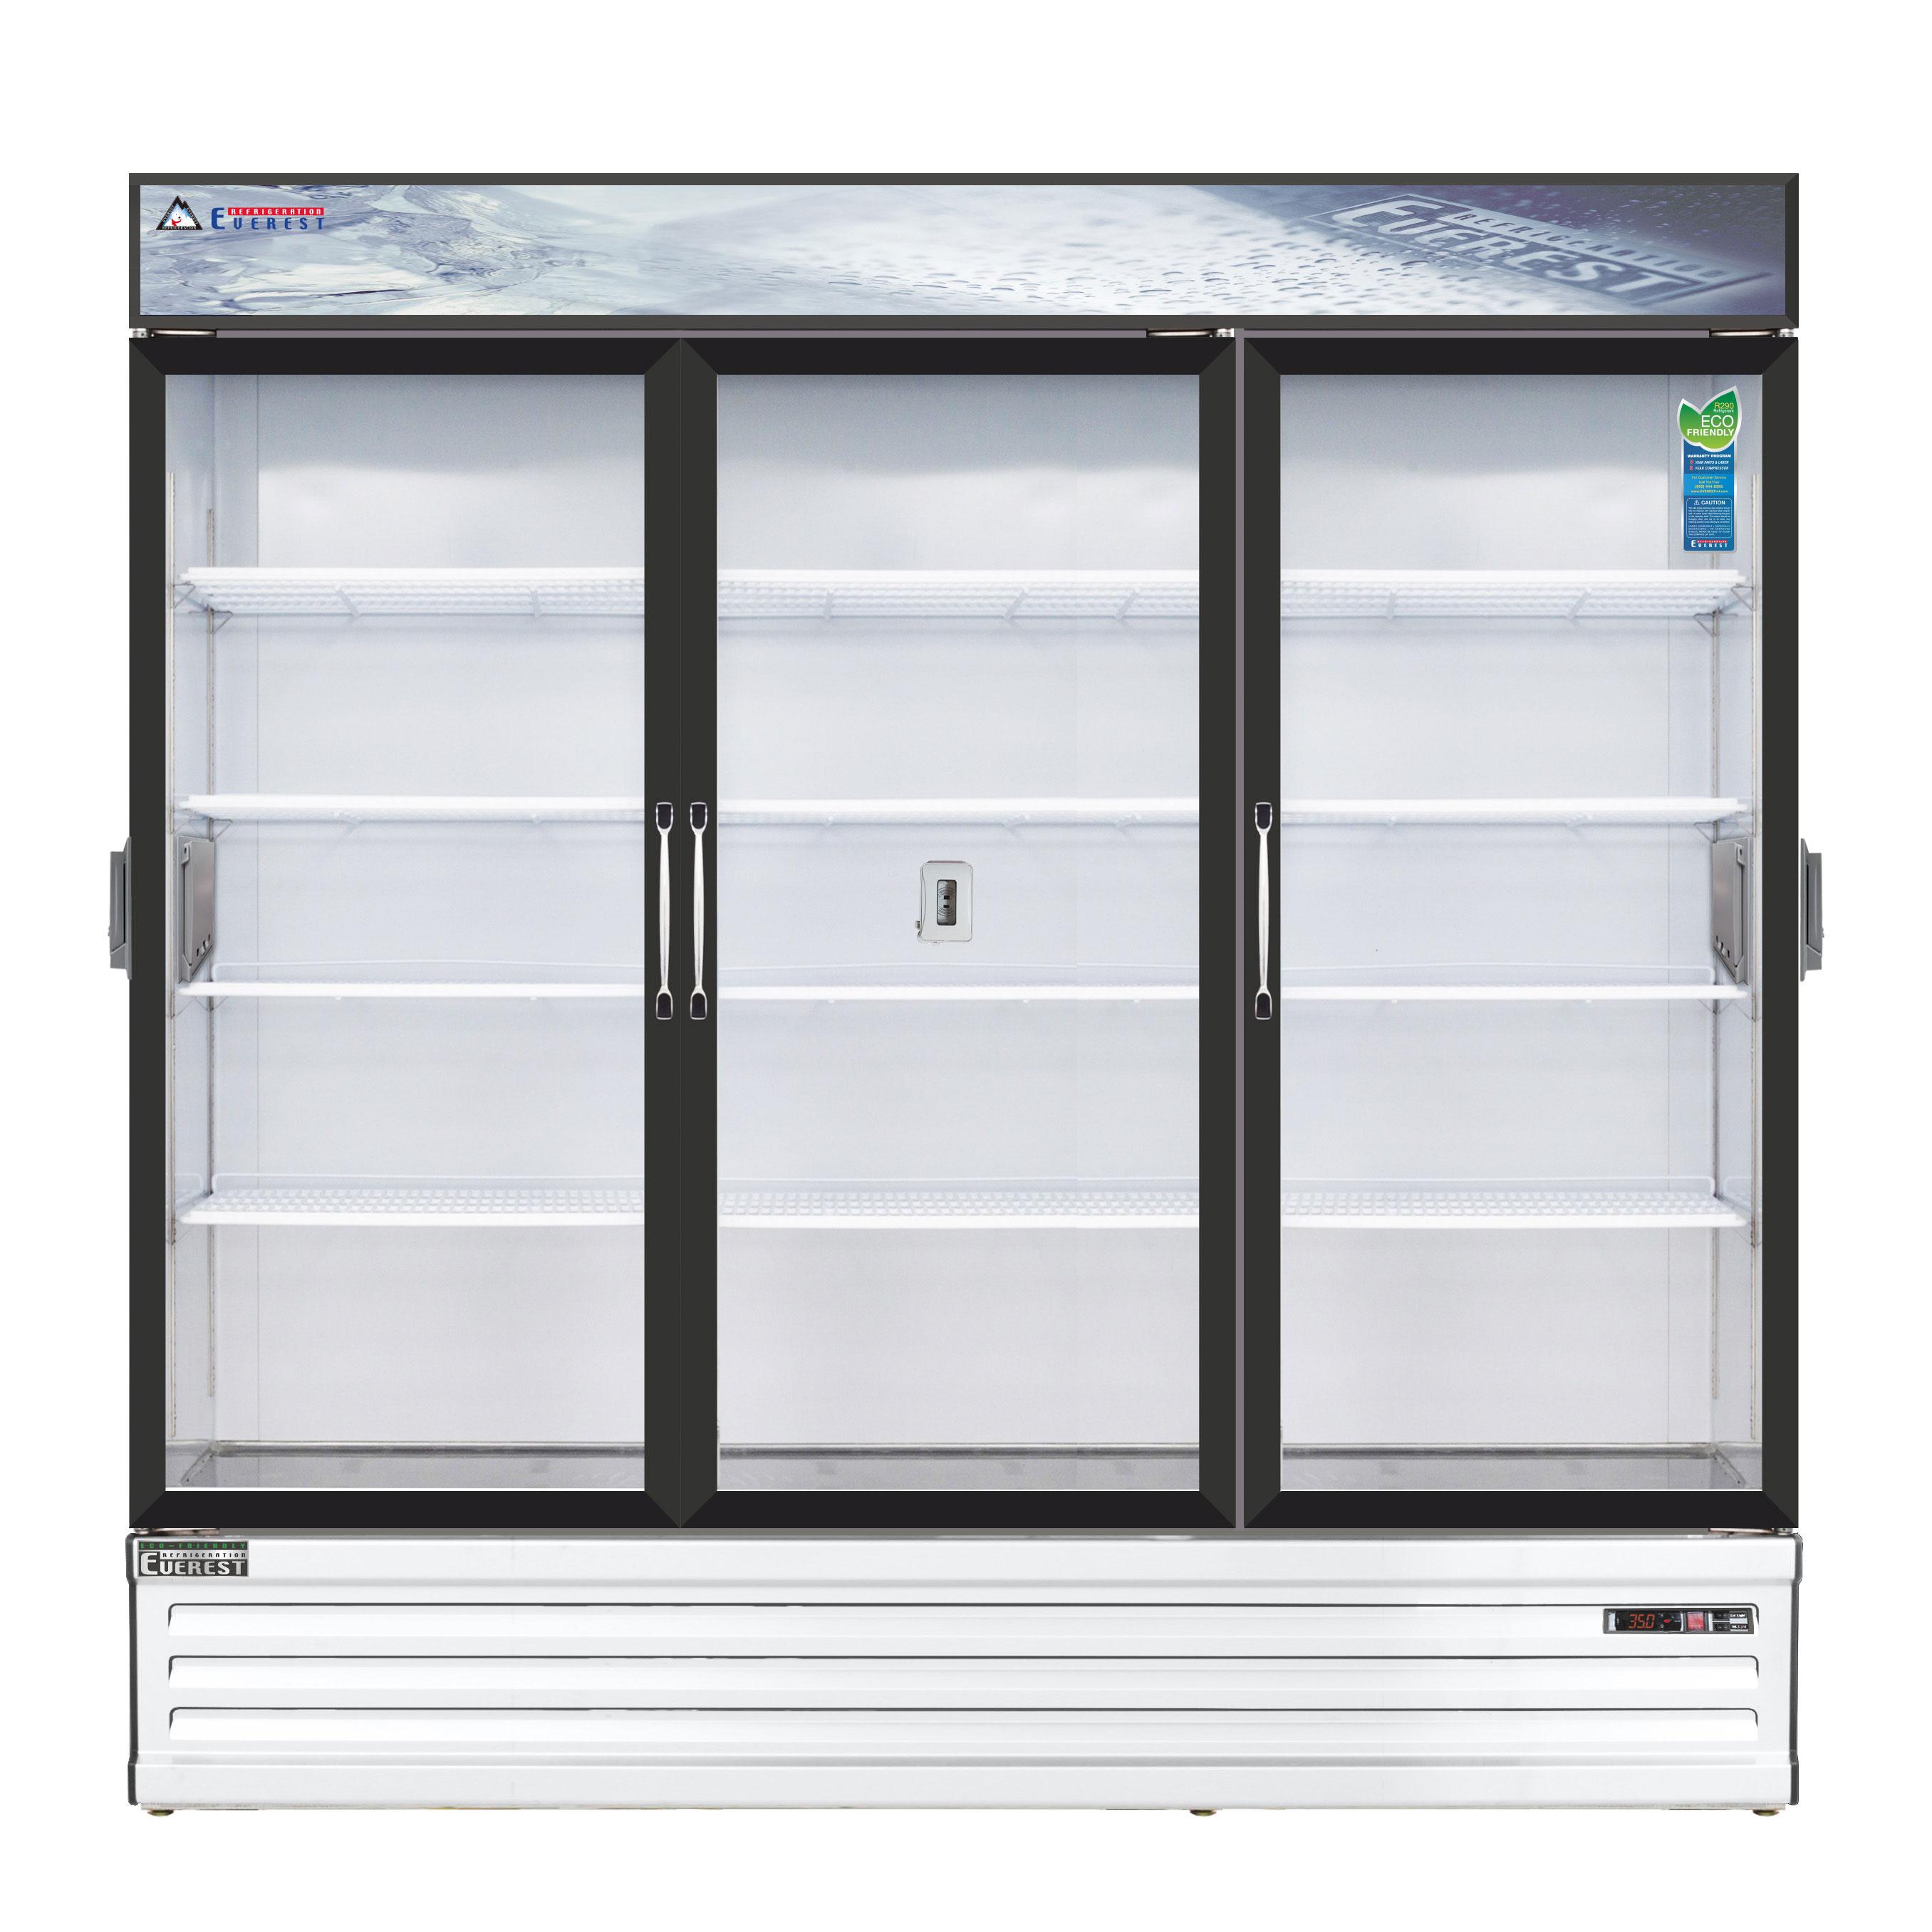 Everest Refrigeration EMSGR69C refrigerator, merchandiser